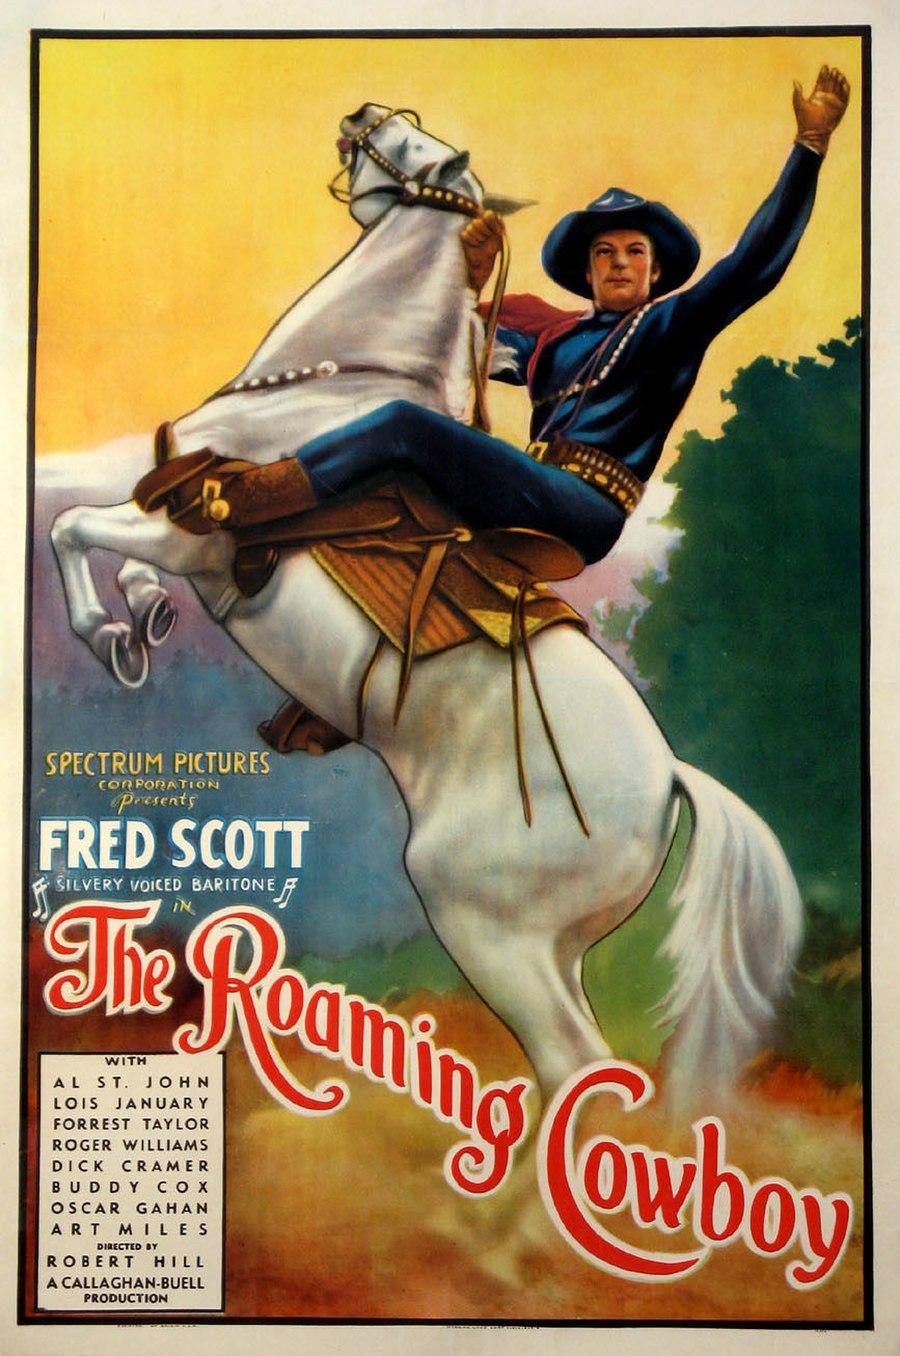 The Roaming Cowboy